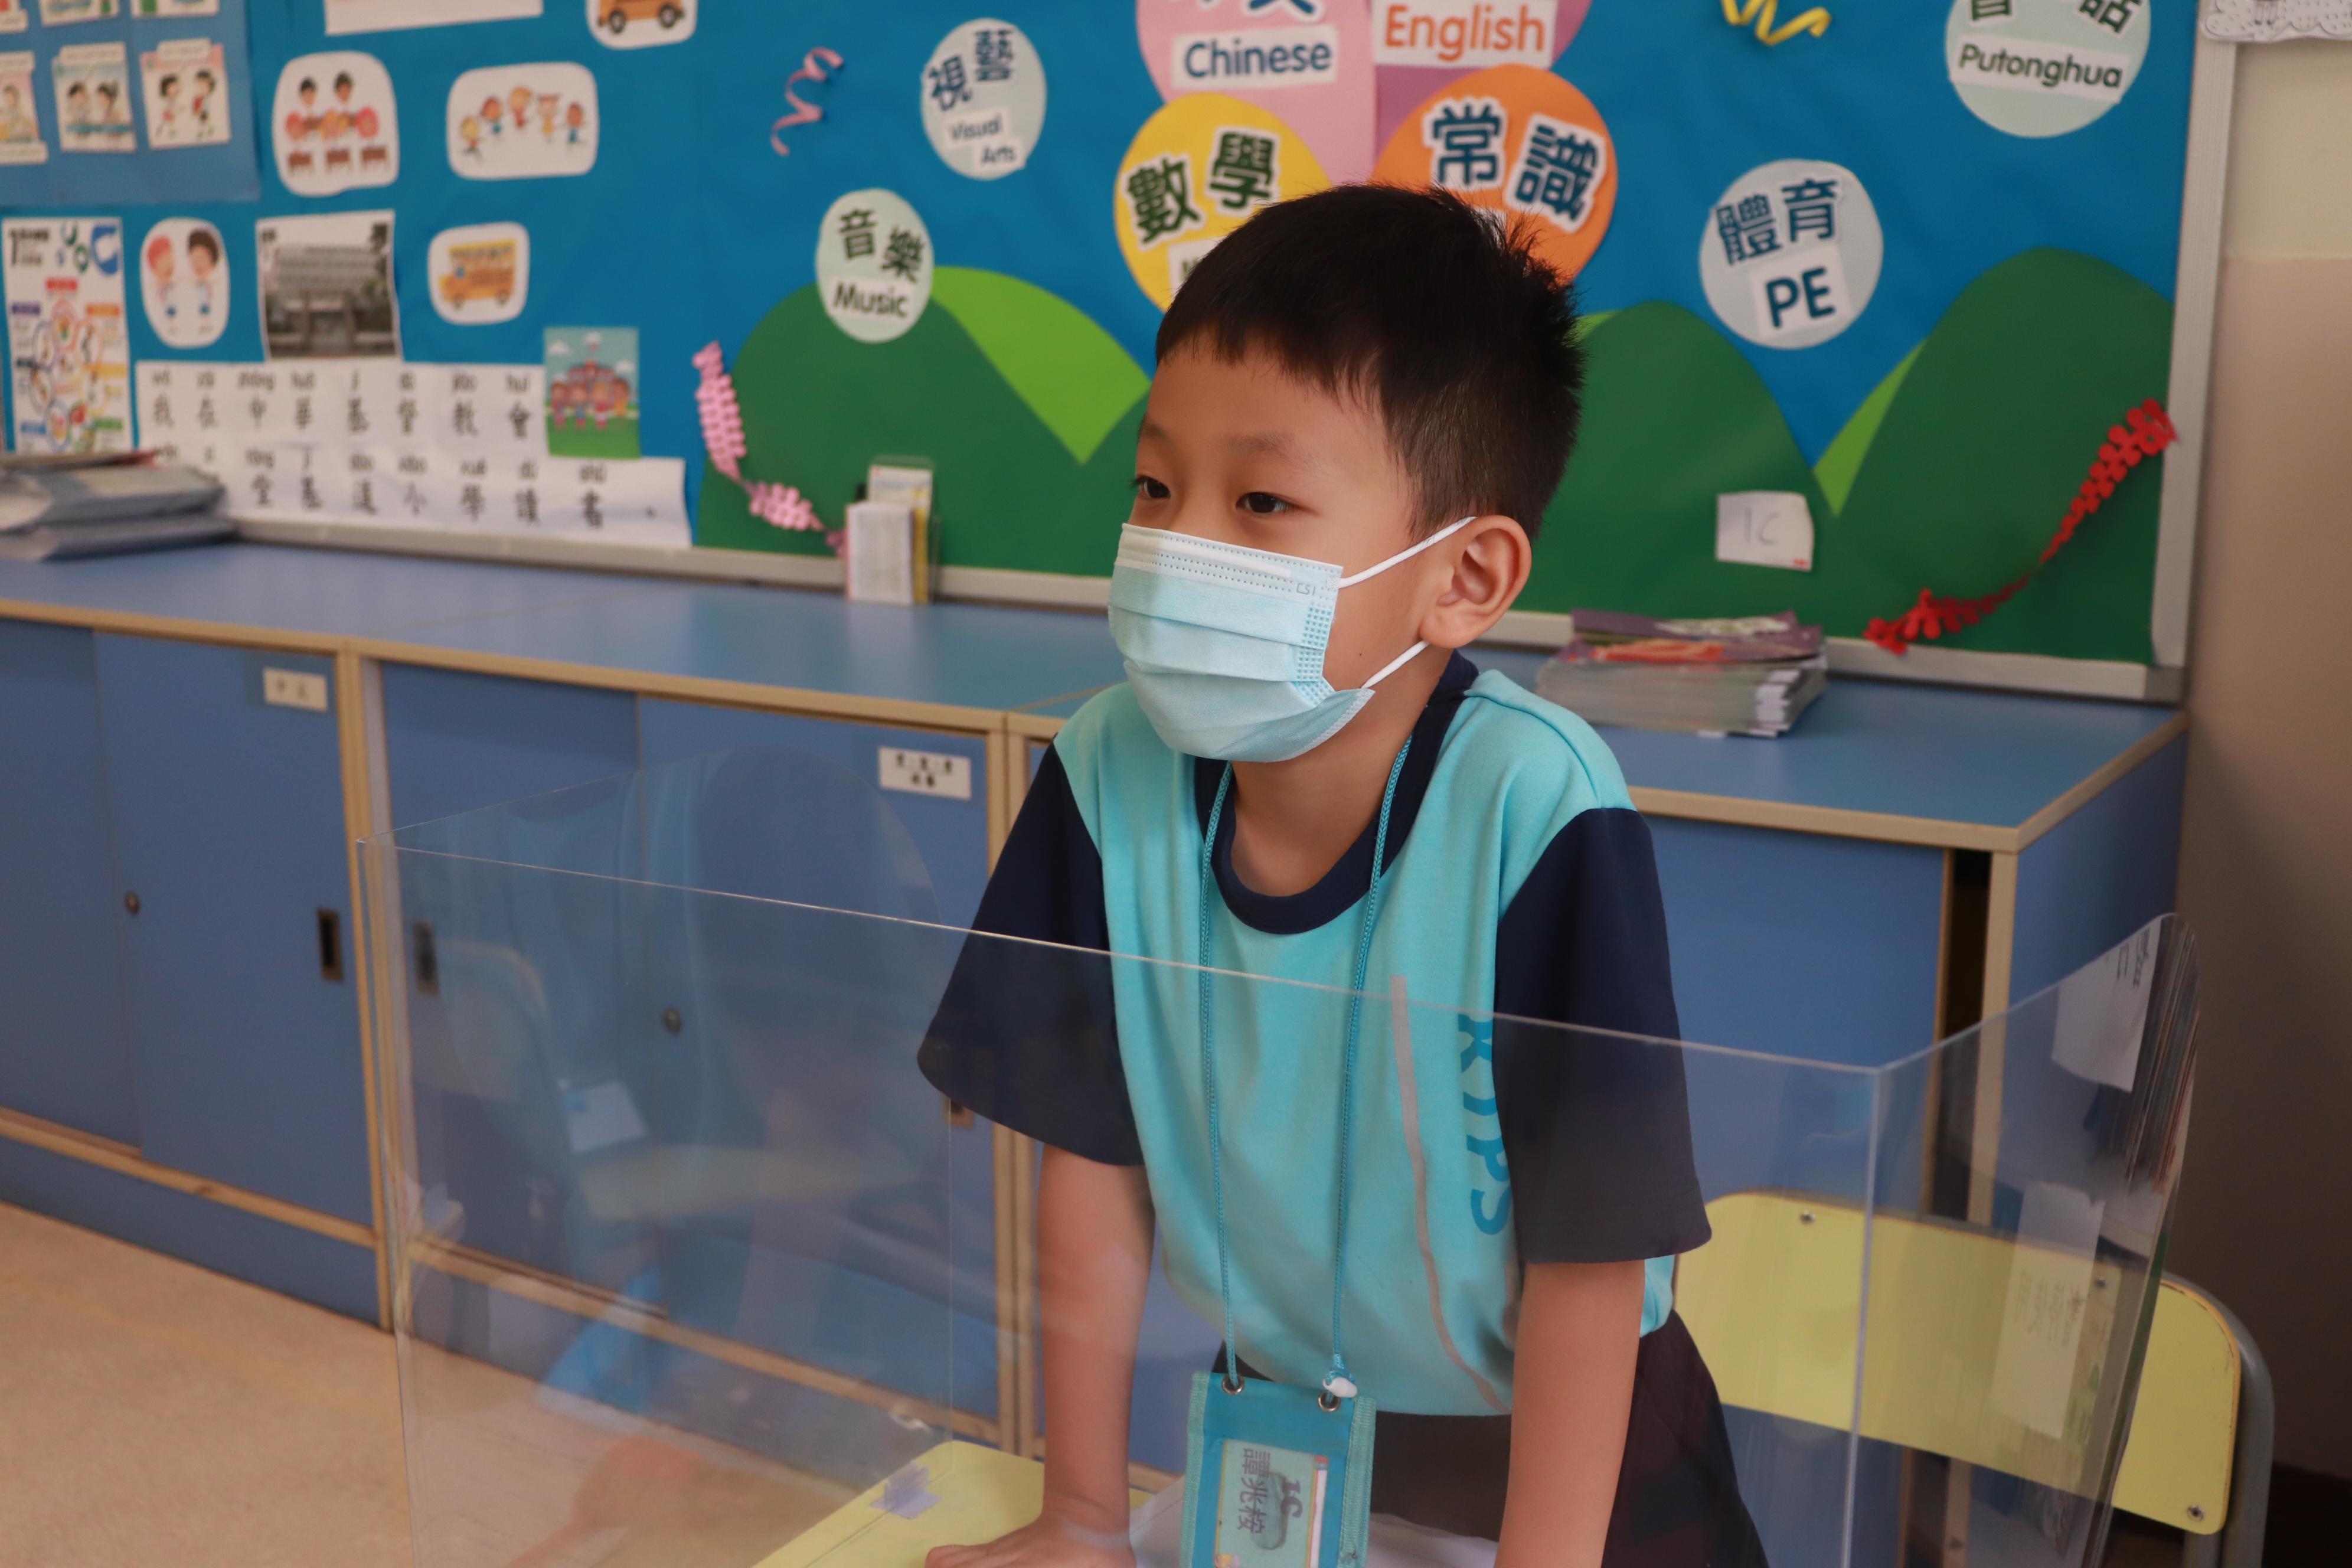 http://keito.school.hk/sites/default/files/img_6587.jpg